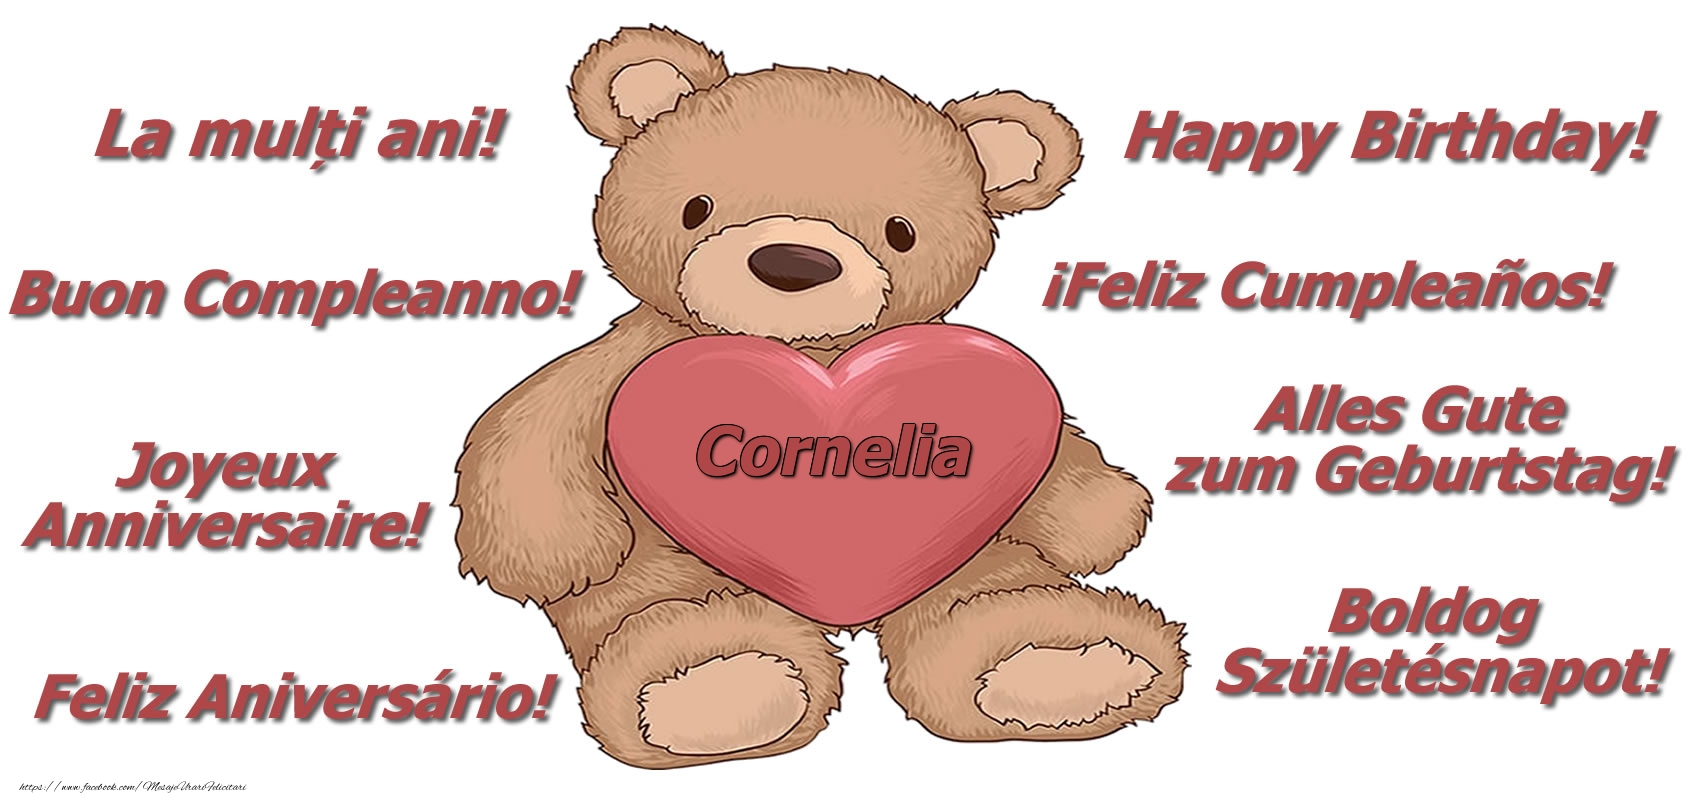 Felicitari de zi de nastere - La multi ani Cornelia! - Ursulet